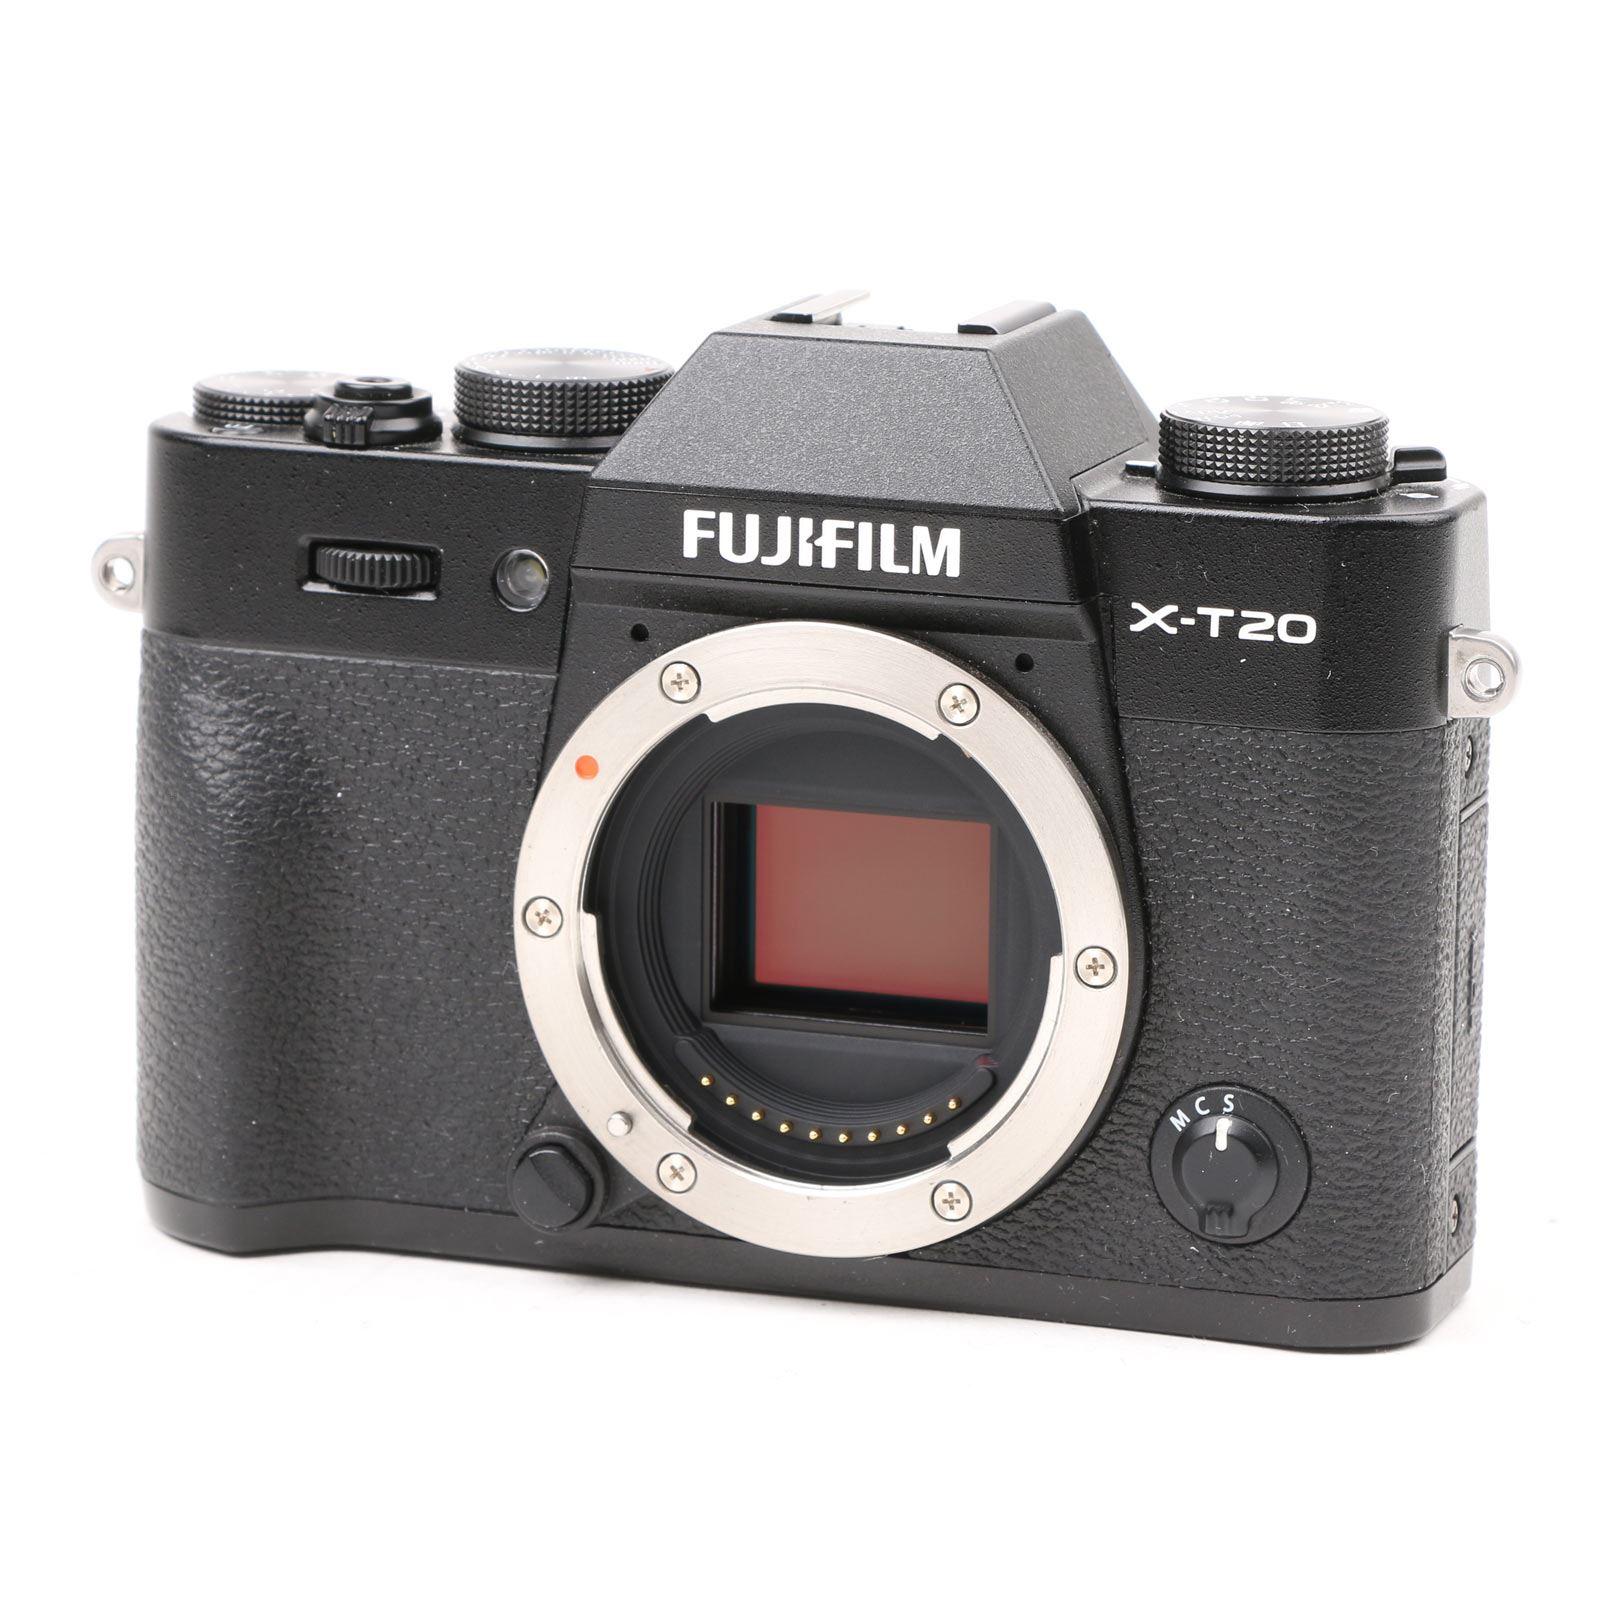 Image of Used Fujifilm X-T20 Digital Camera Body - Black